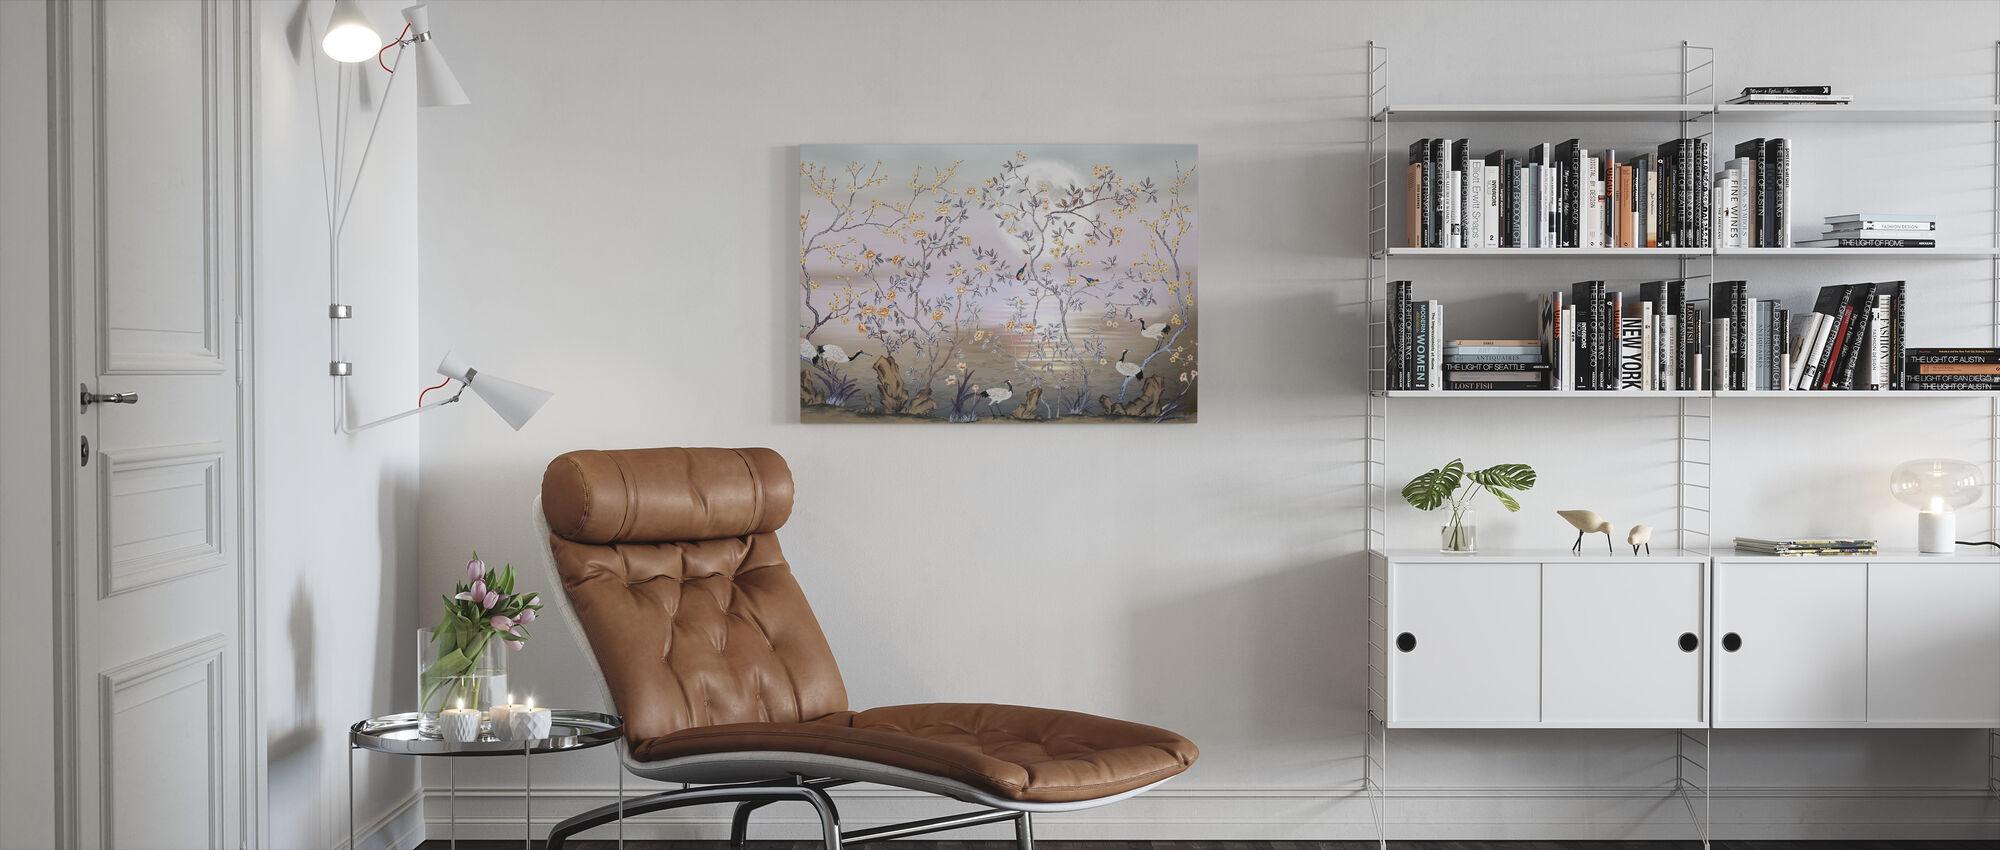 Birds in Beautiful Scenery - Canvas print - Living Room